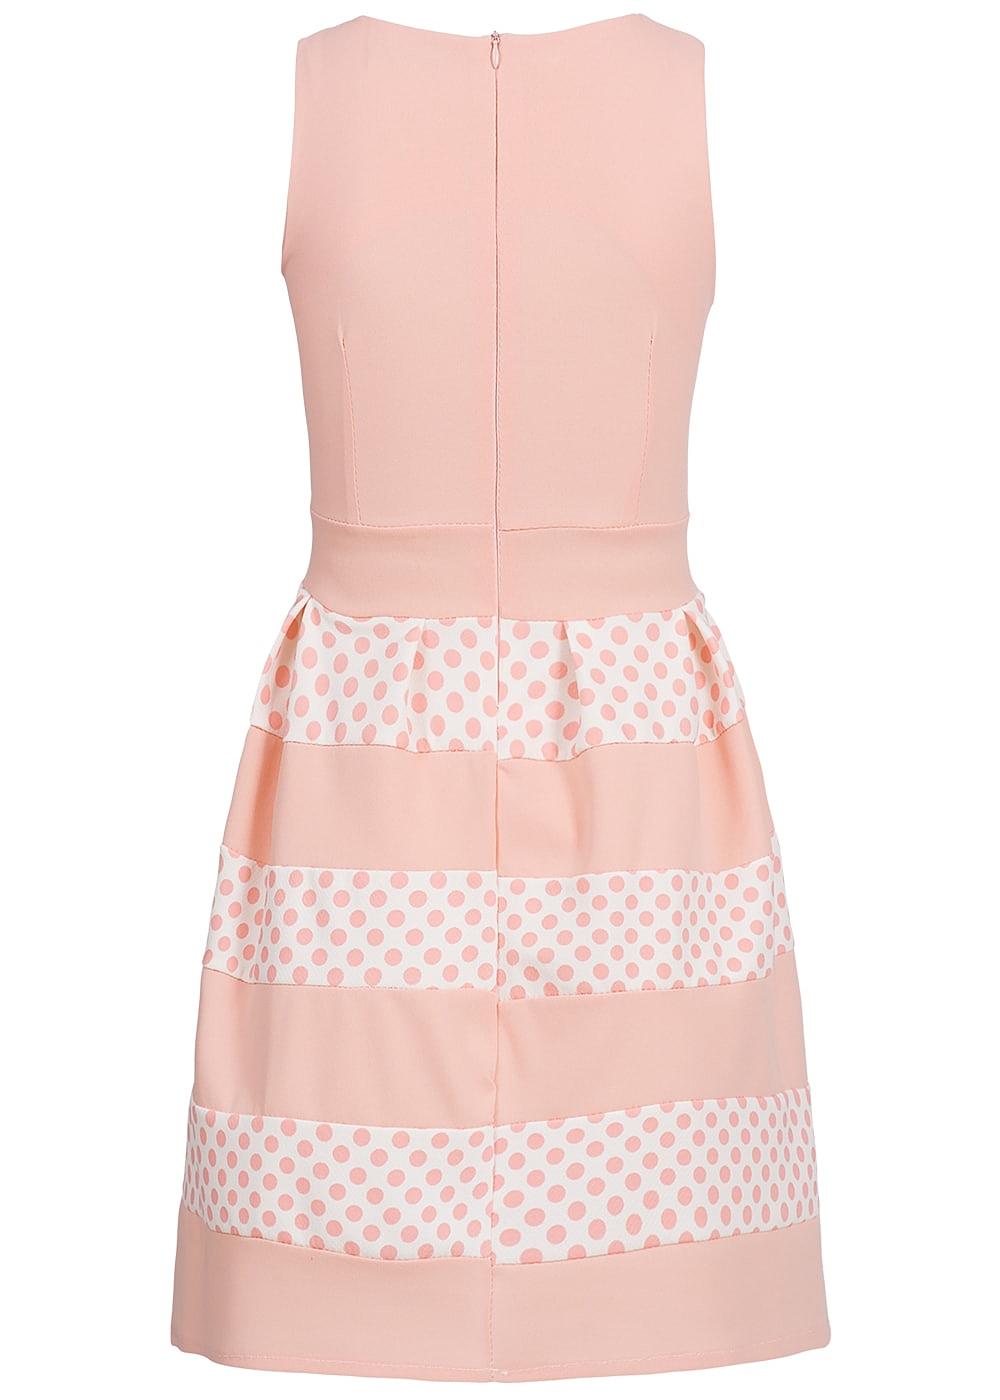 f800ea72ba0 Styleboom Fashion Damen Kleid Punkte Muster rosa weiss - 77onlineshop